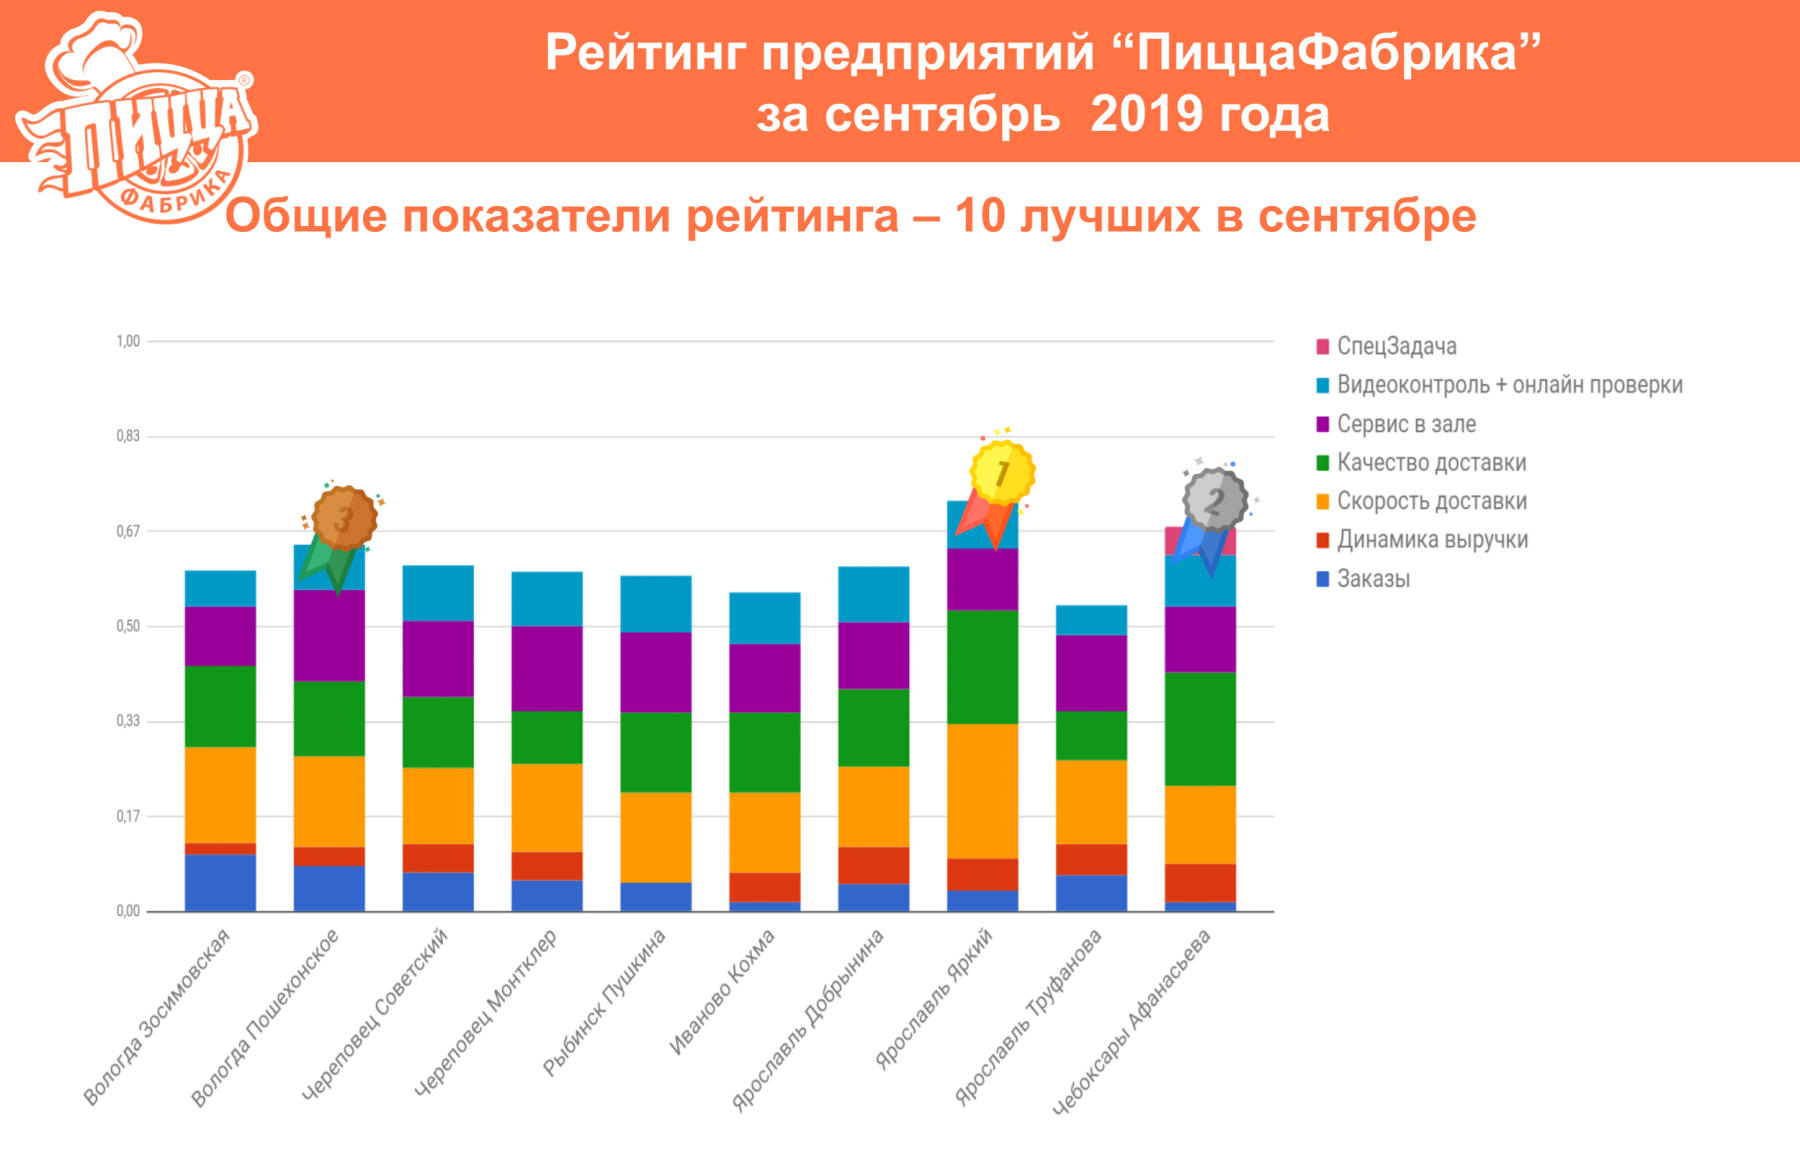 Рейтинг предприятий ПиццаФабрики сентябрь 2019